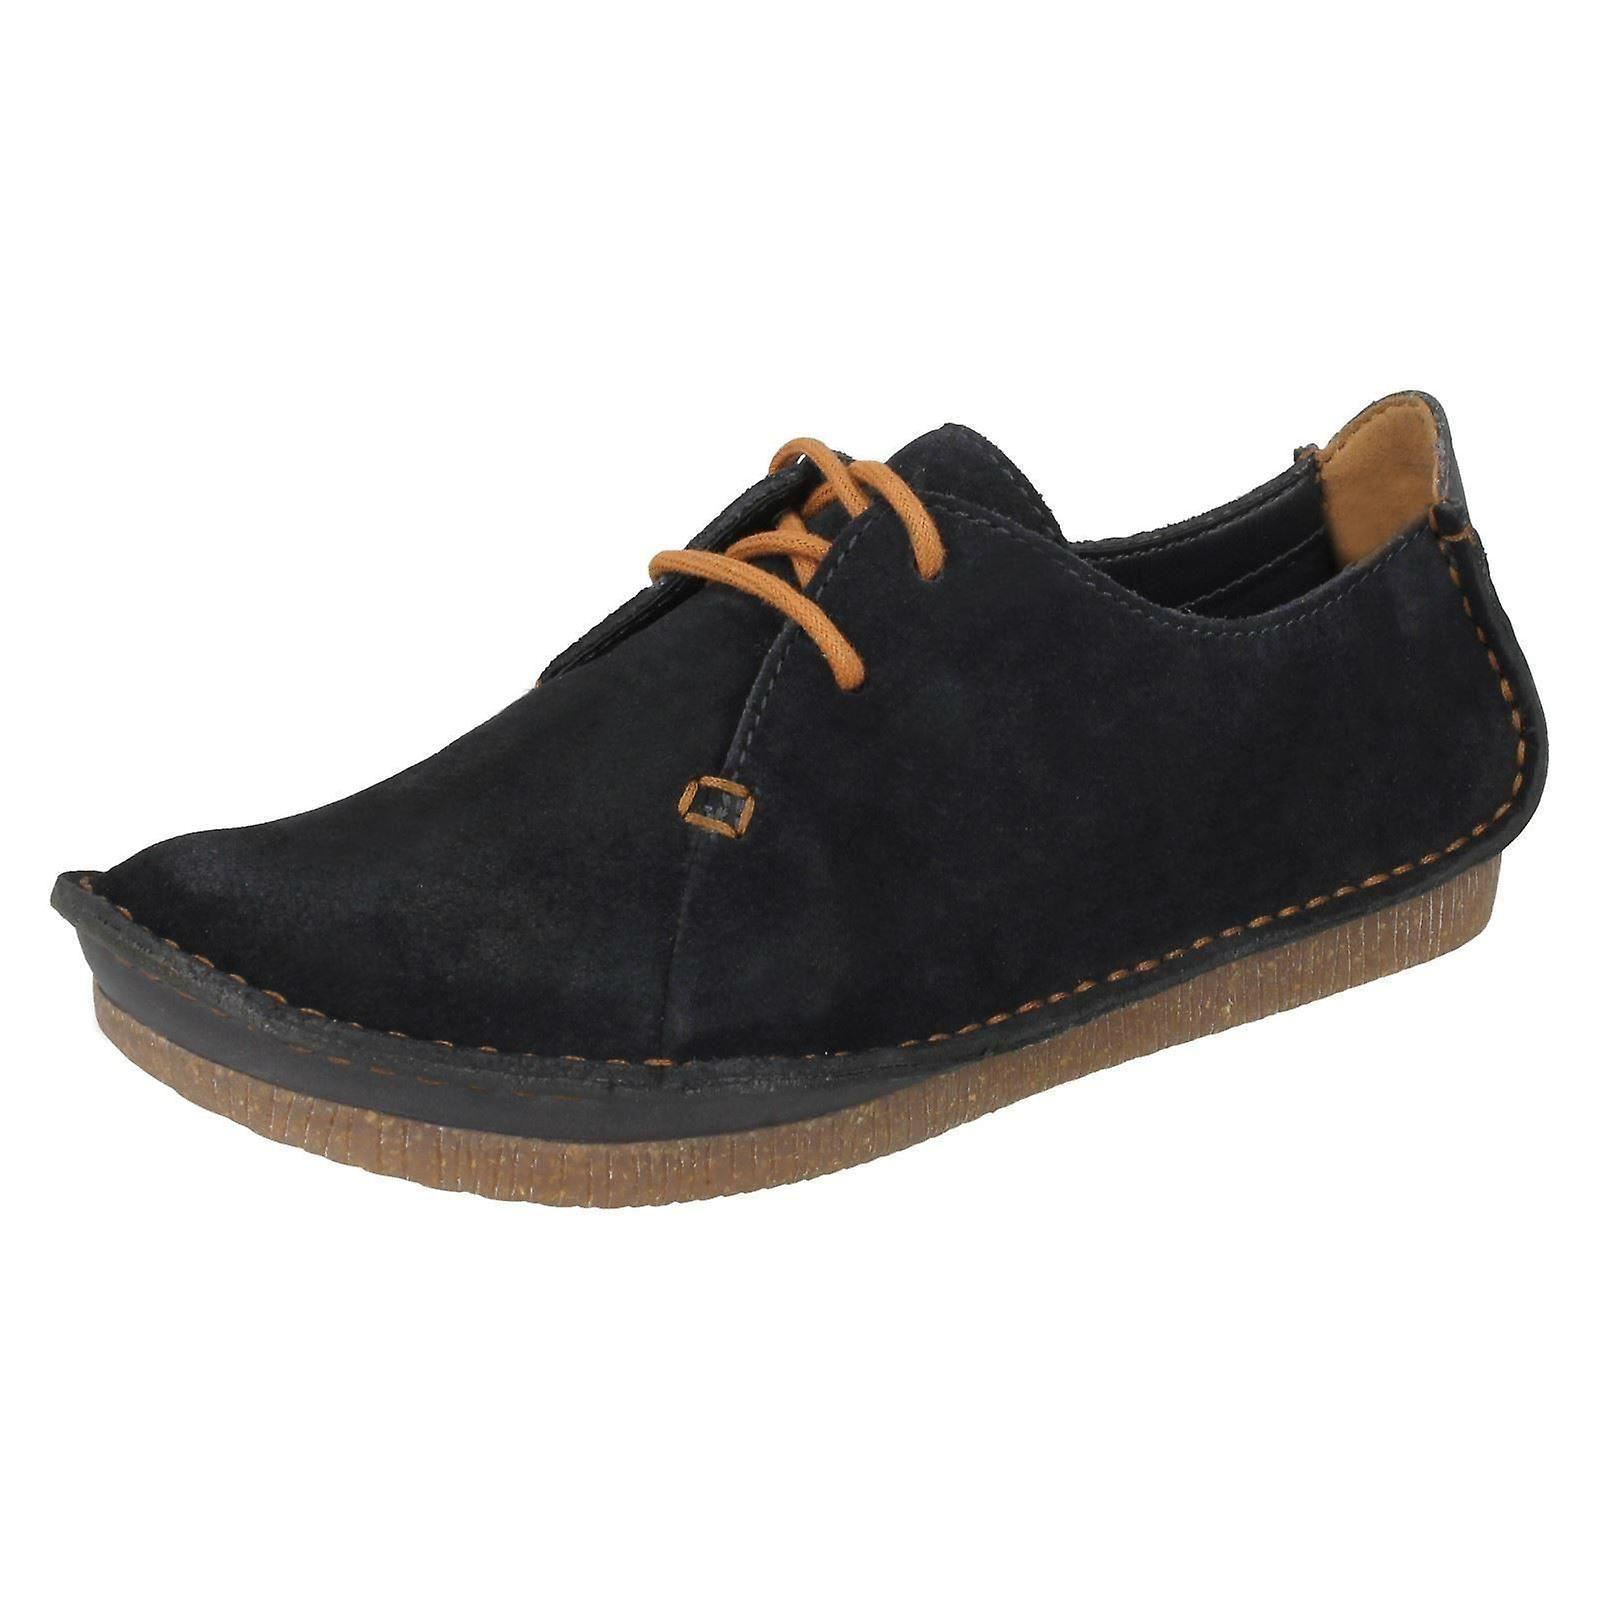 Clarks Damen Lace Up Smart-Casual Schuhe Janey Mae